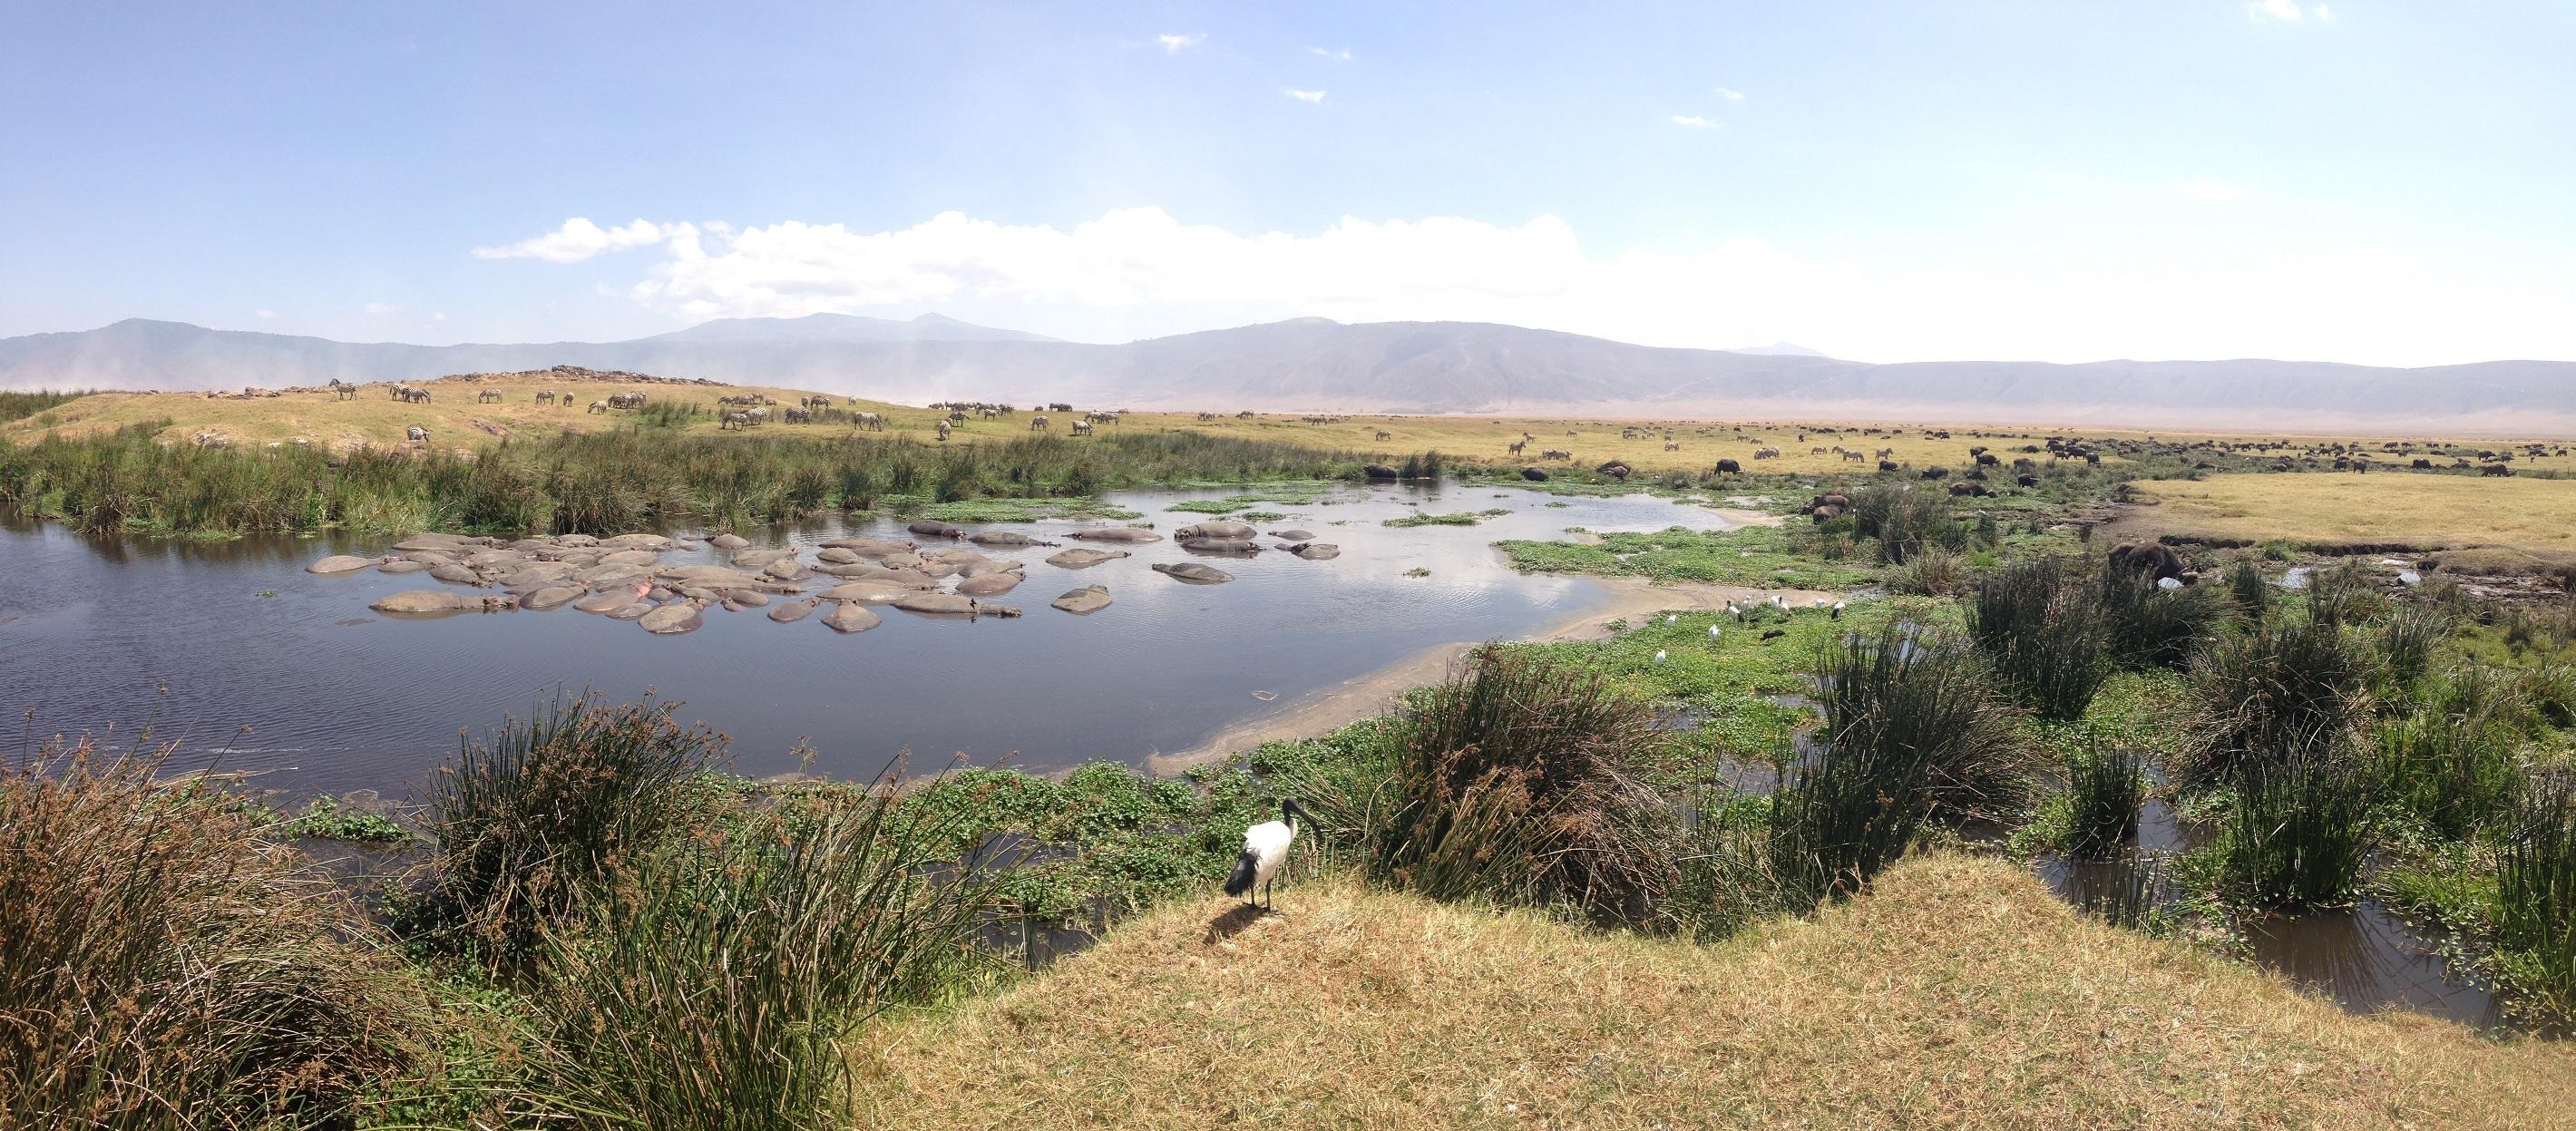 Wildlife in Ngorongoro Crater (Dustin Balderach)